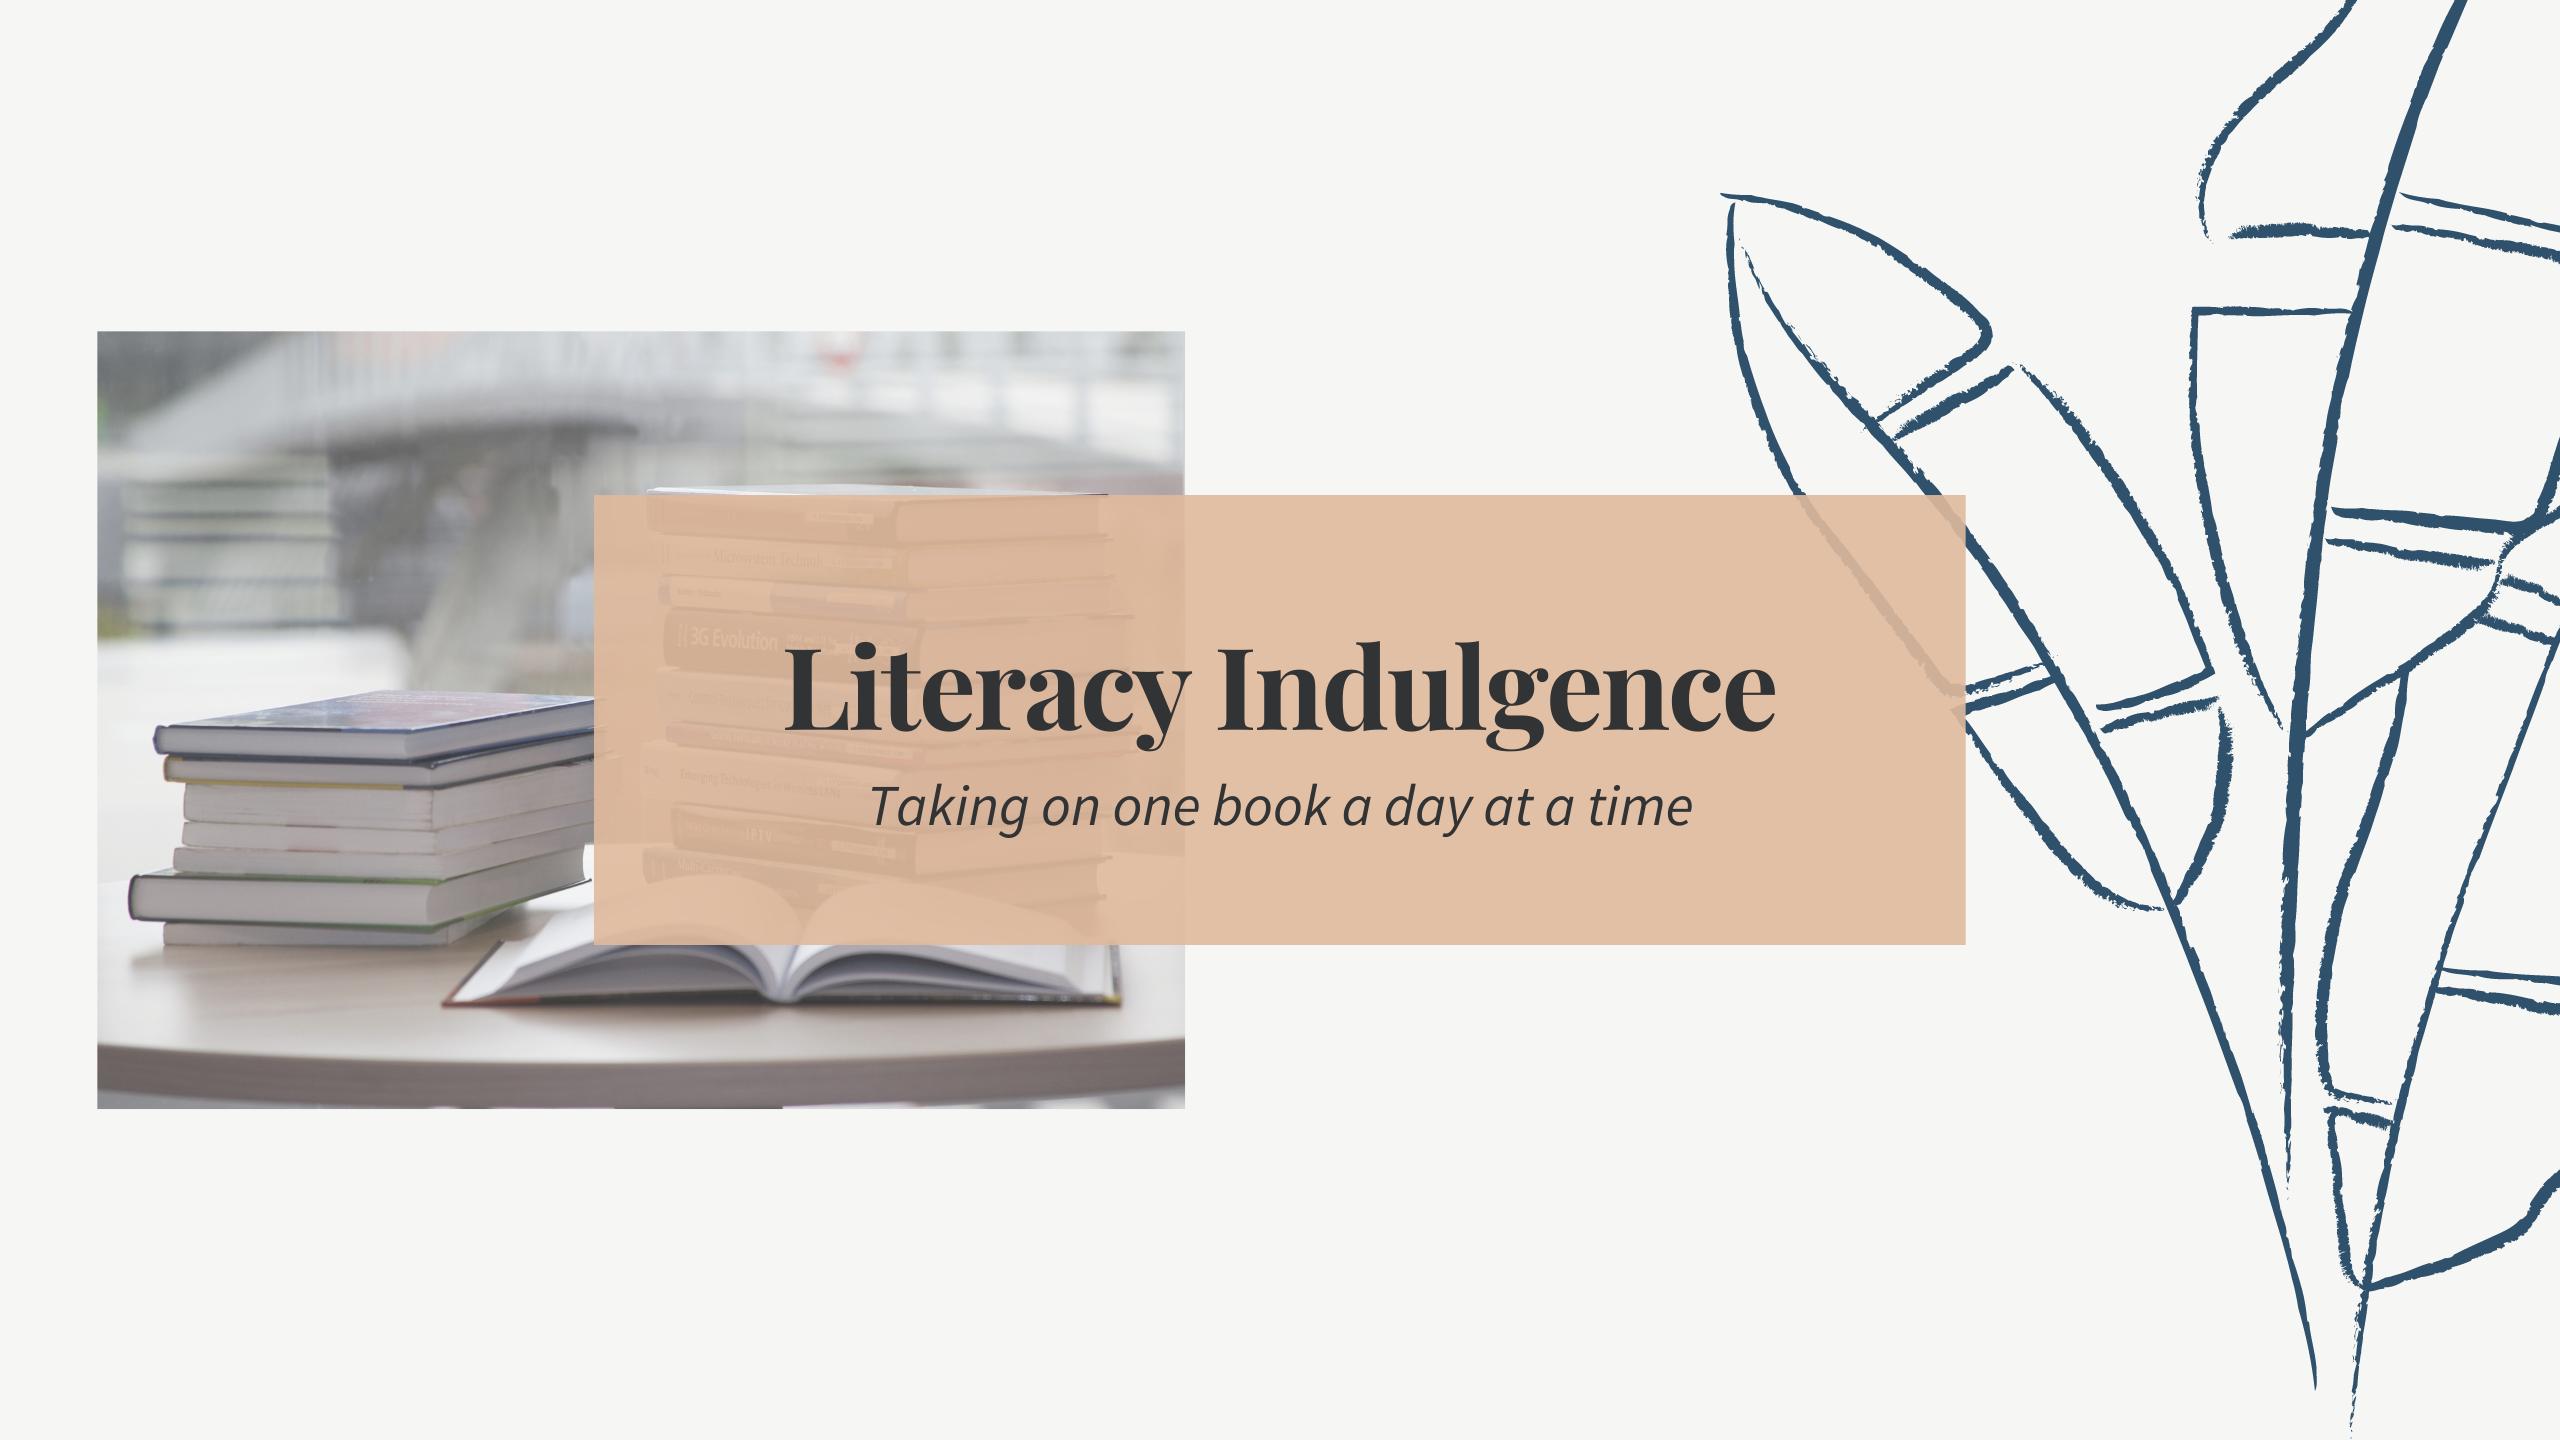 Literacy Indulgence